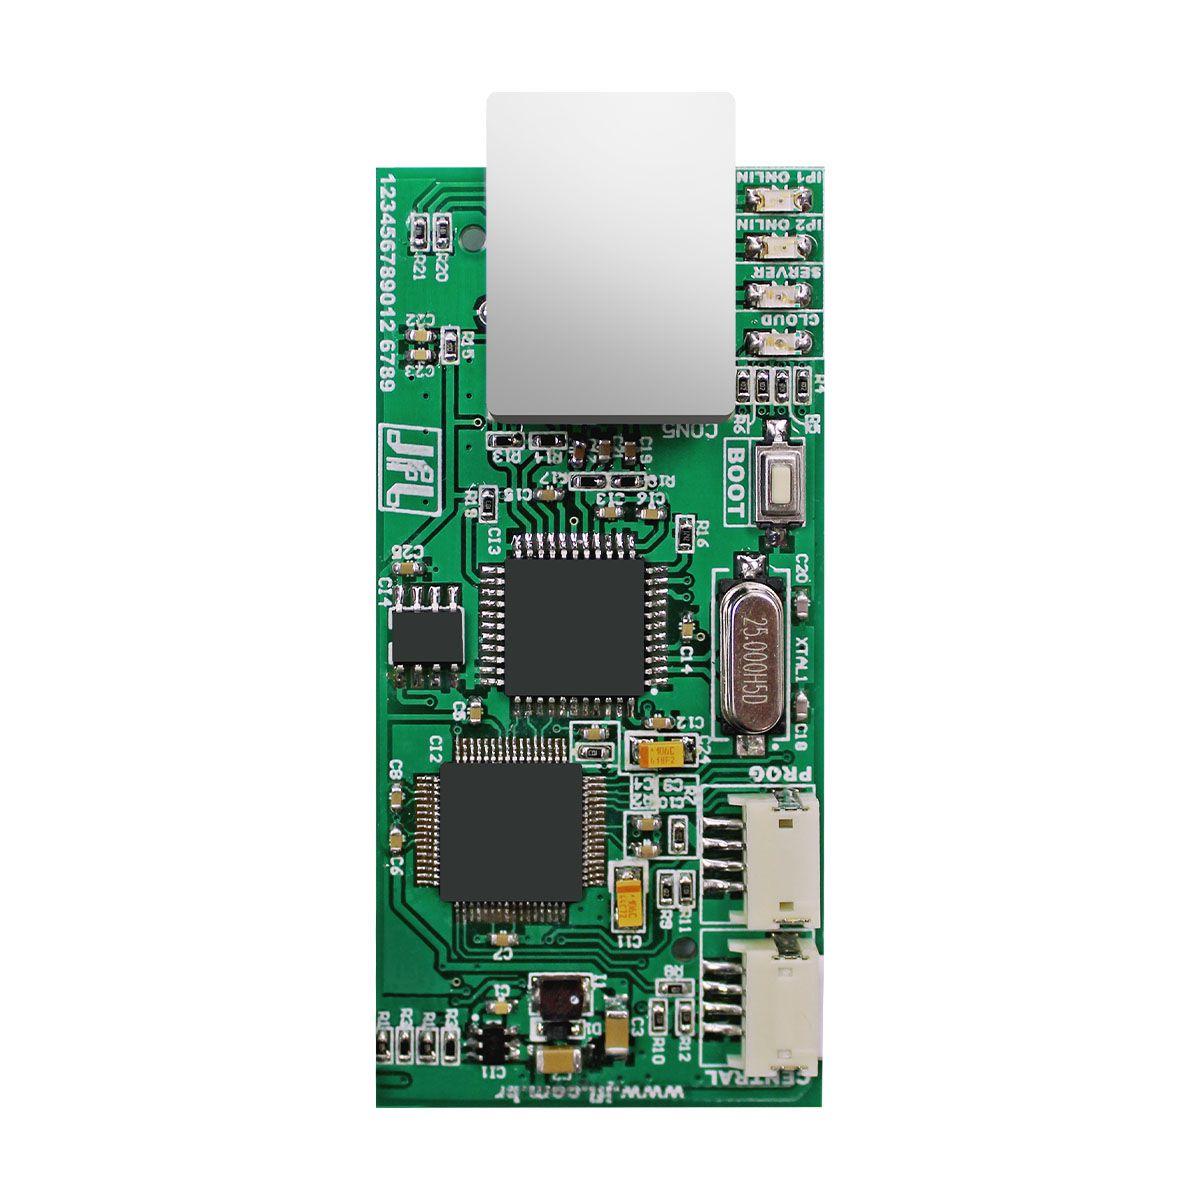 Kit Alarme Monitorado Active 32 Duo Sensor Sl 220 Duo Jfl